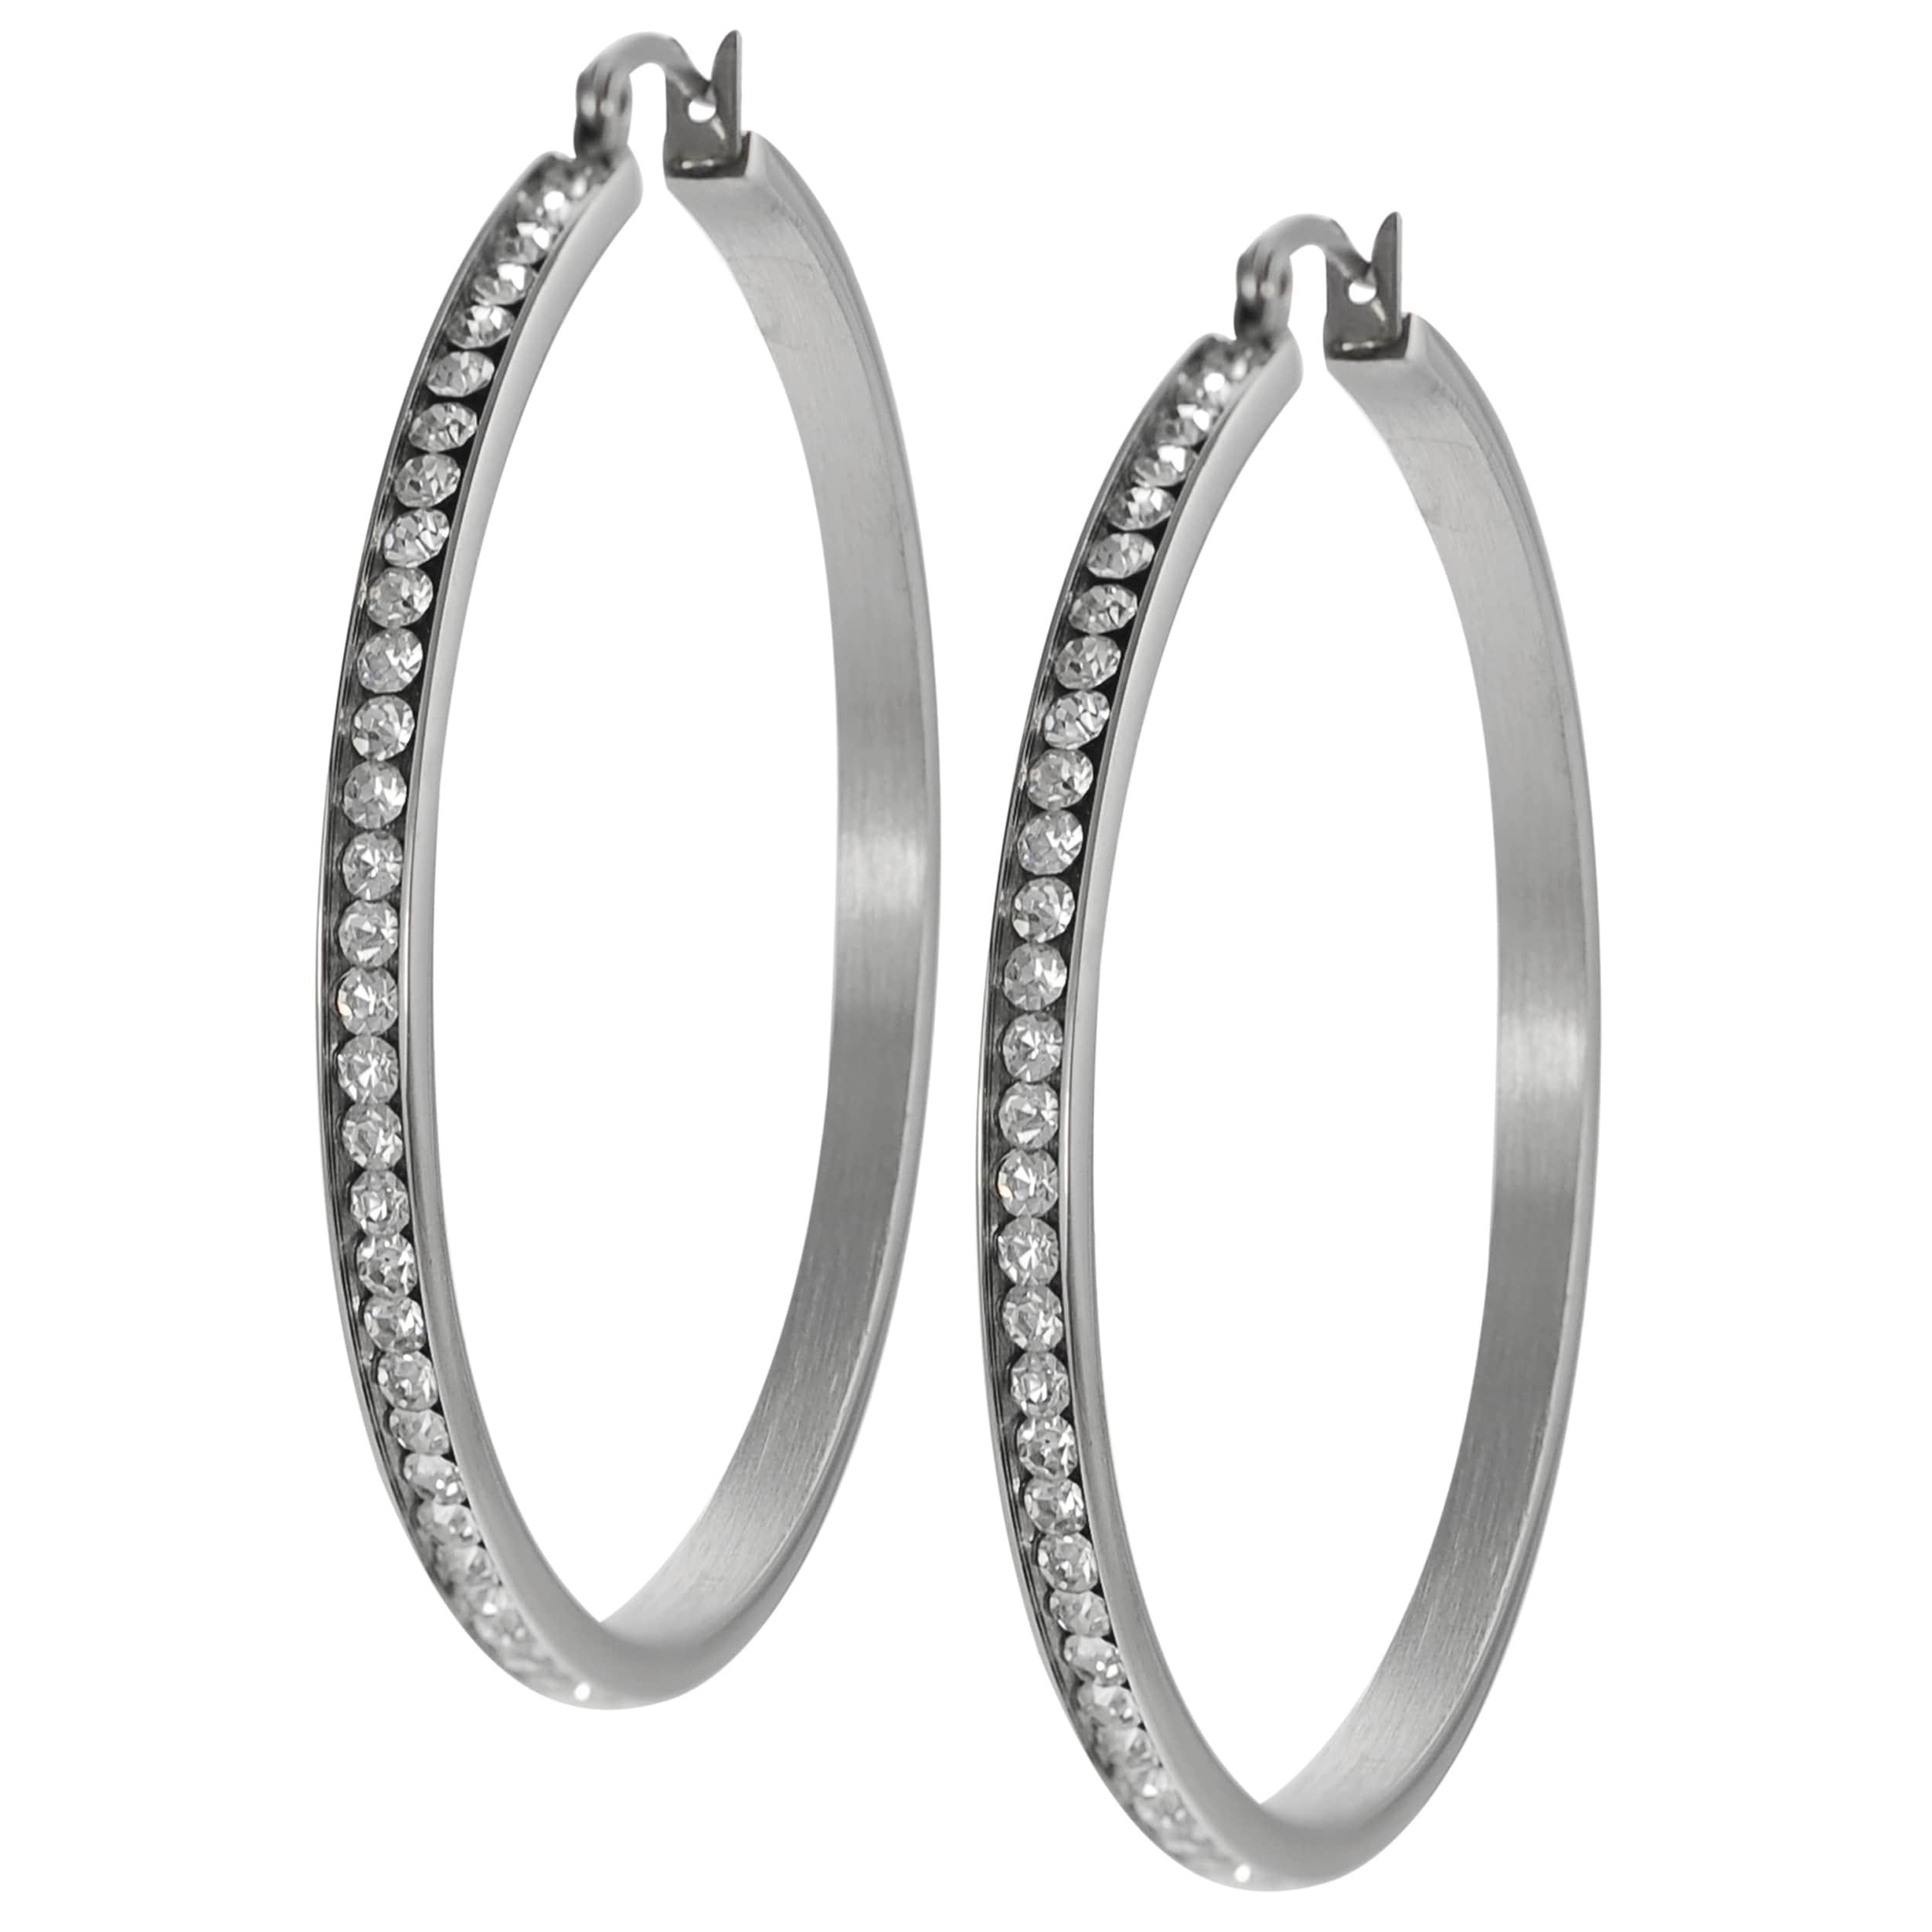 Journee Collection Stainless Steel Cubic Zirconia 50-mm Hoop Earrings